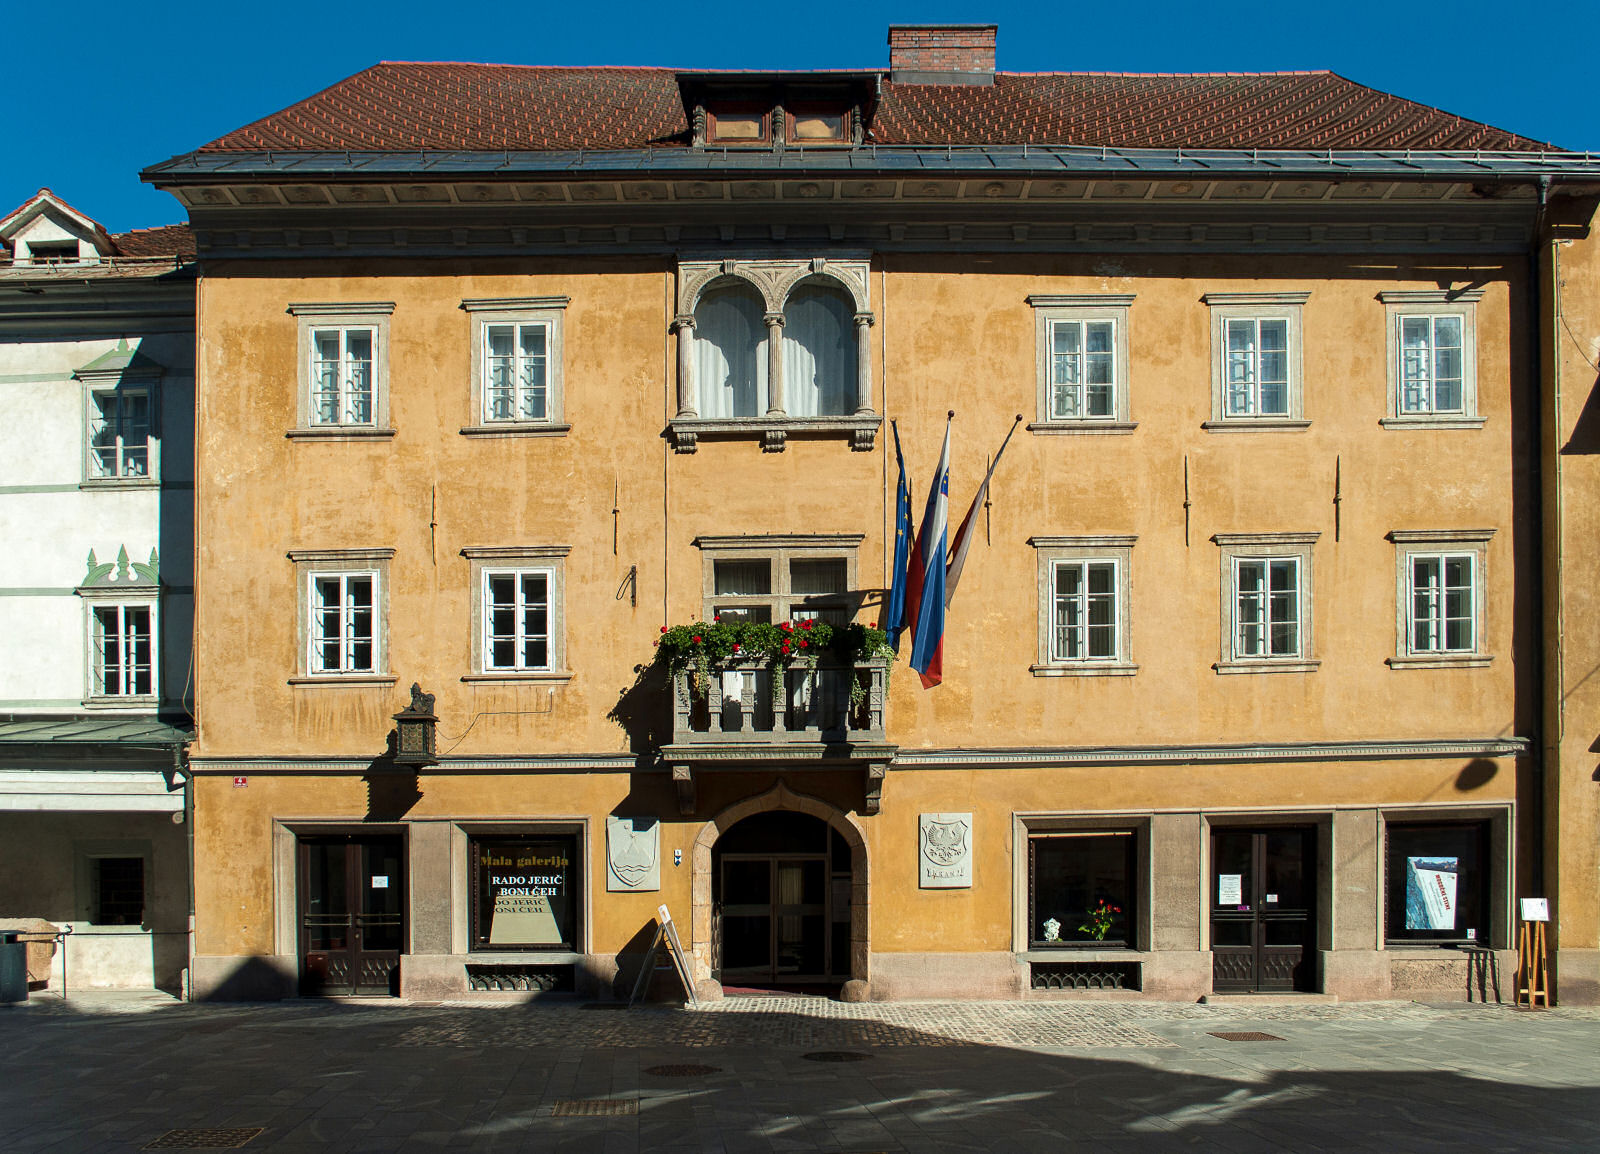 City hall Kranj, Slovenia